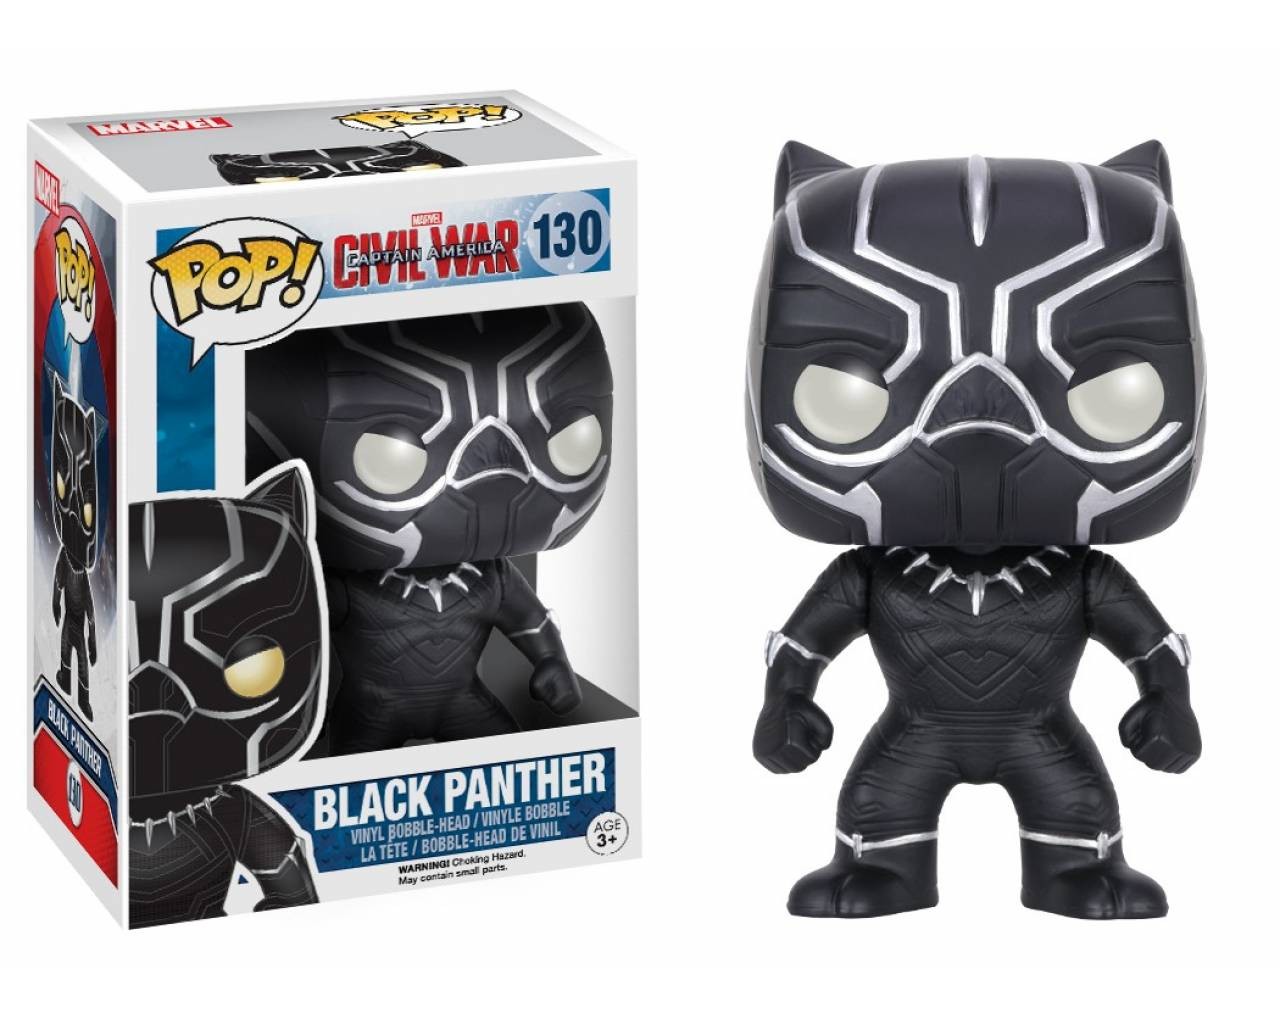 Black Panther (Civil War) Pop! Vinyl